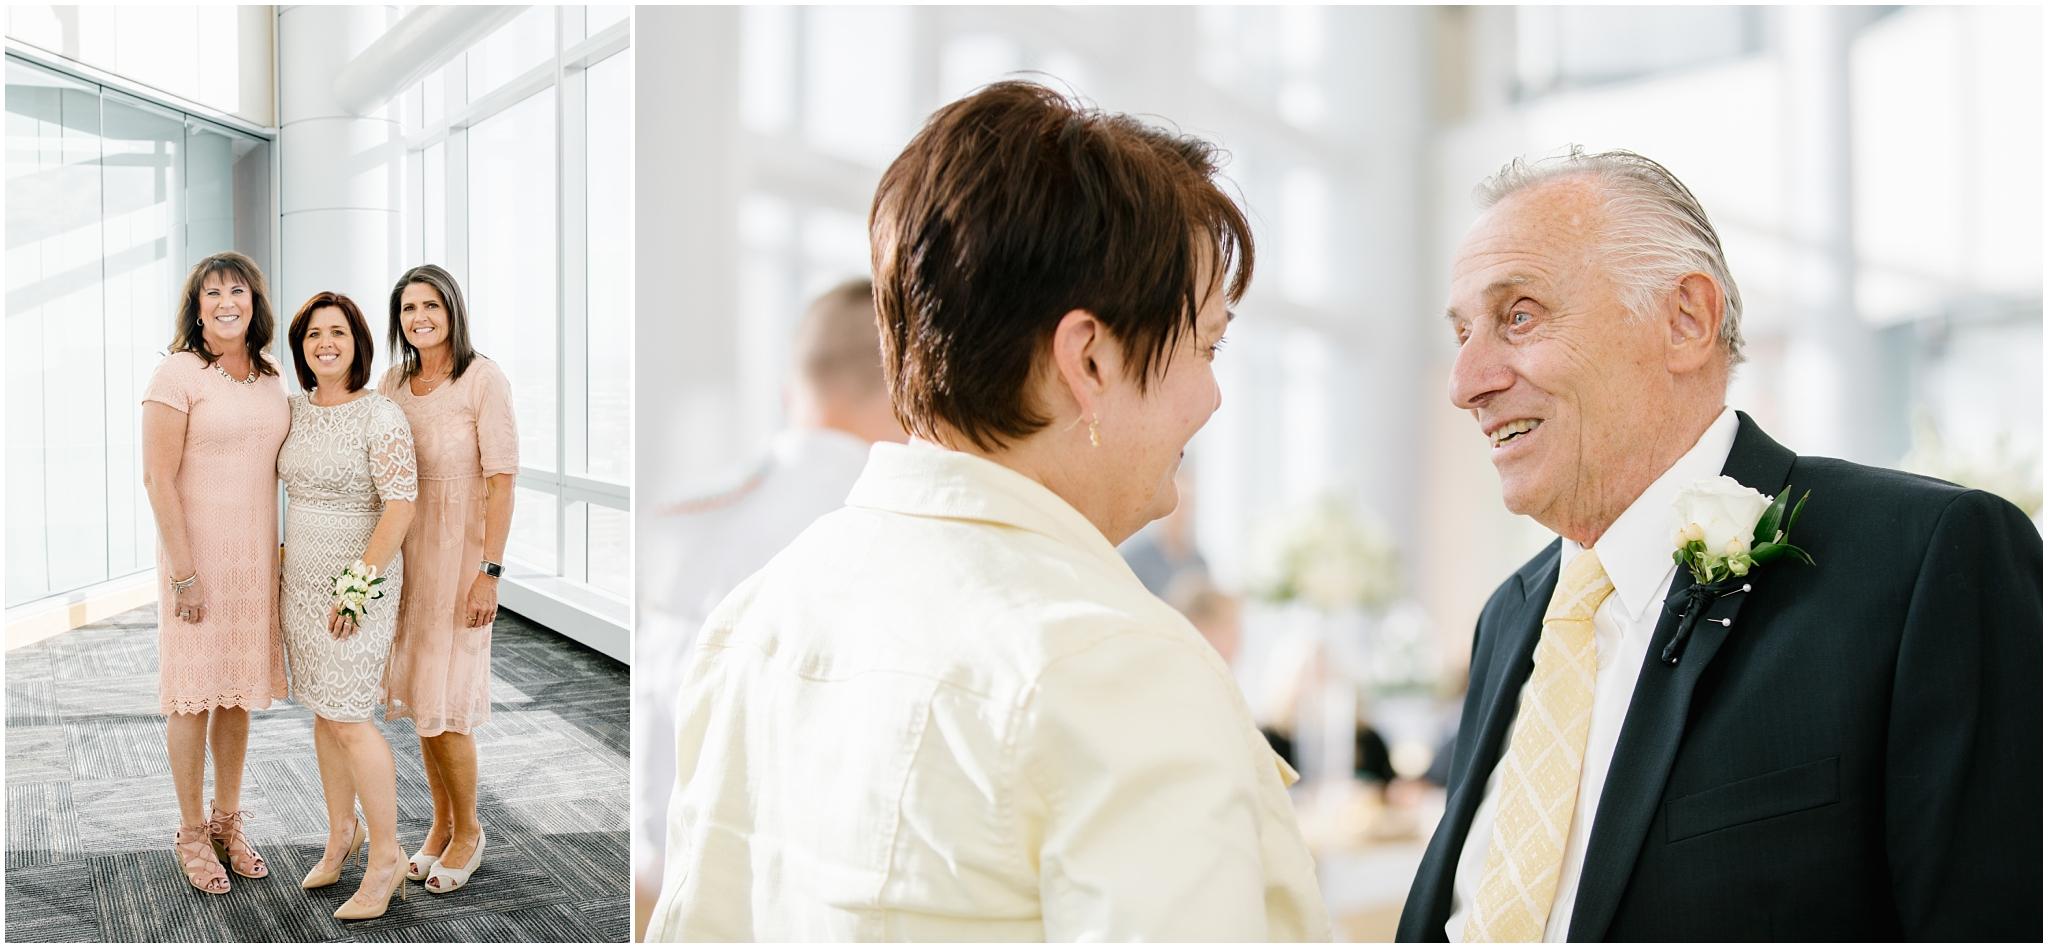 CherylandTyler-388_Lizzie-B-Imagery-Utah-Wedding-Photographer-Salt-Lake-City-Temple-Wells-Fargo-Building-Reception.jpg